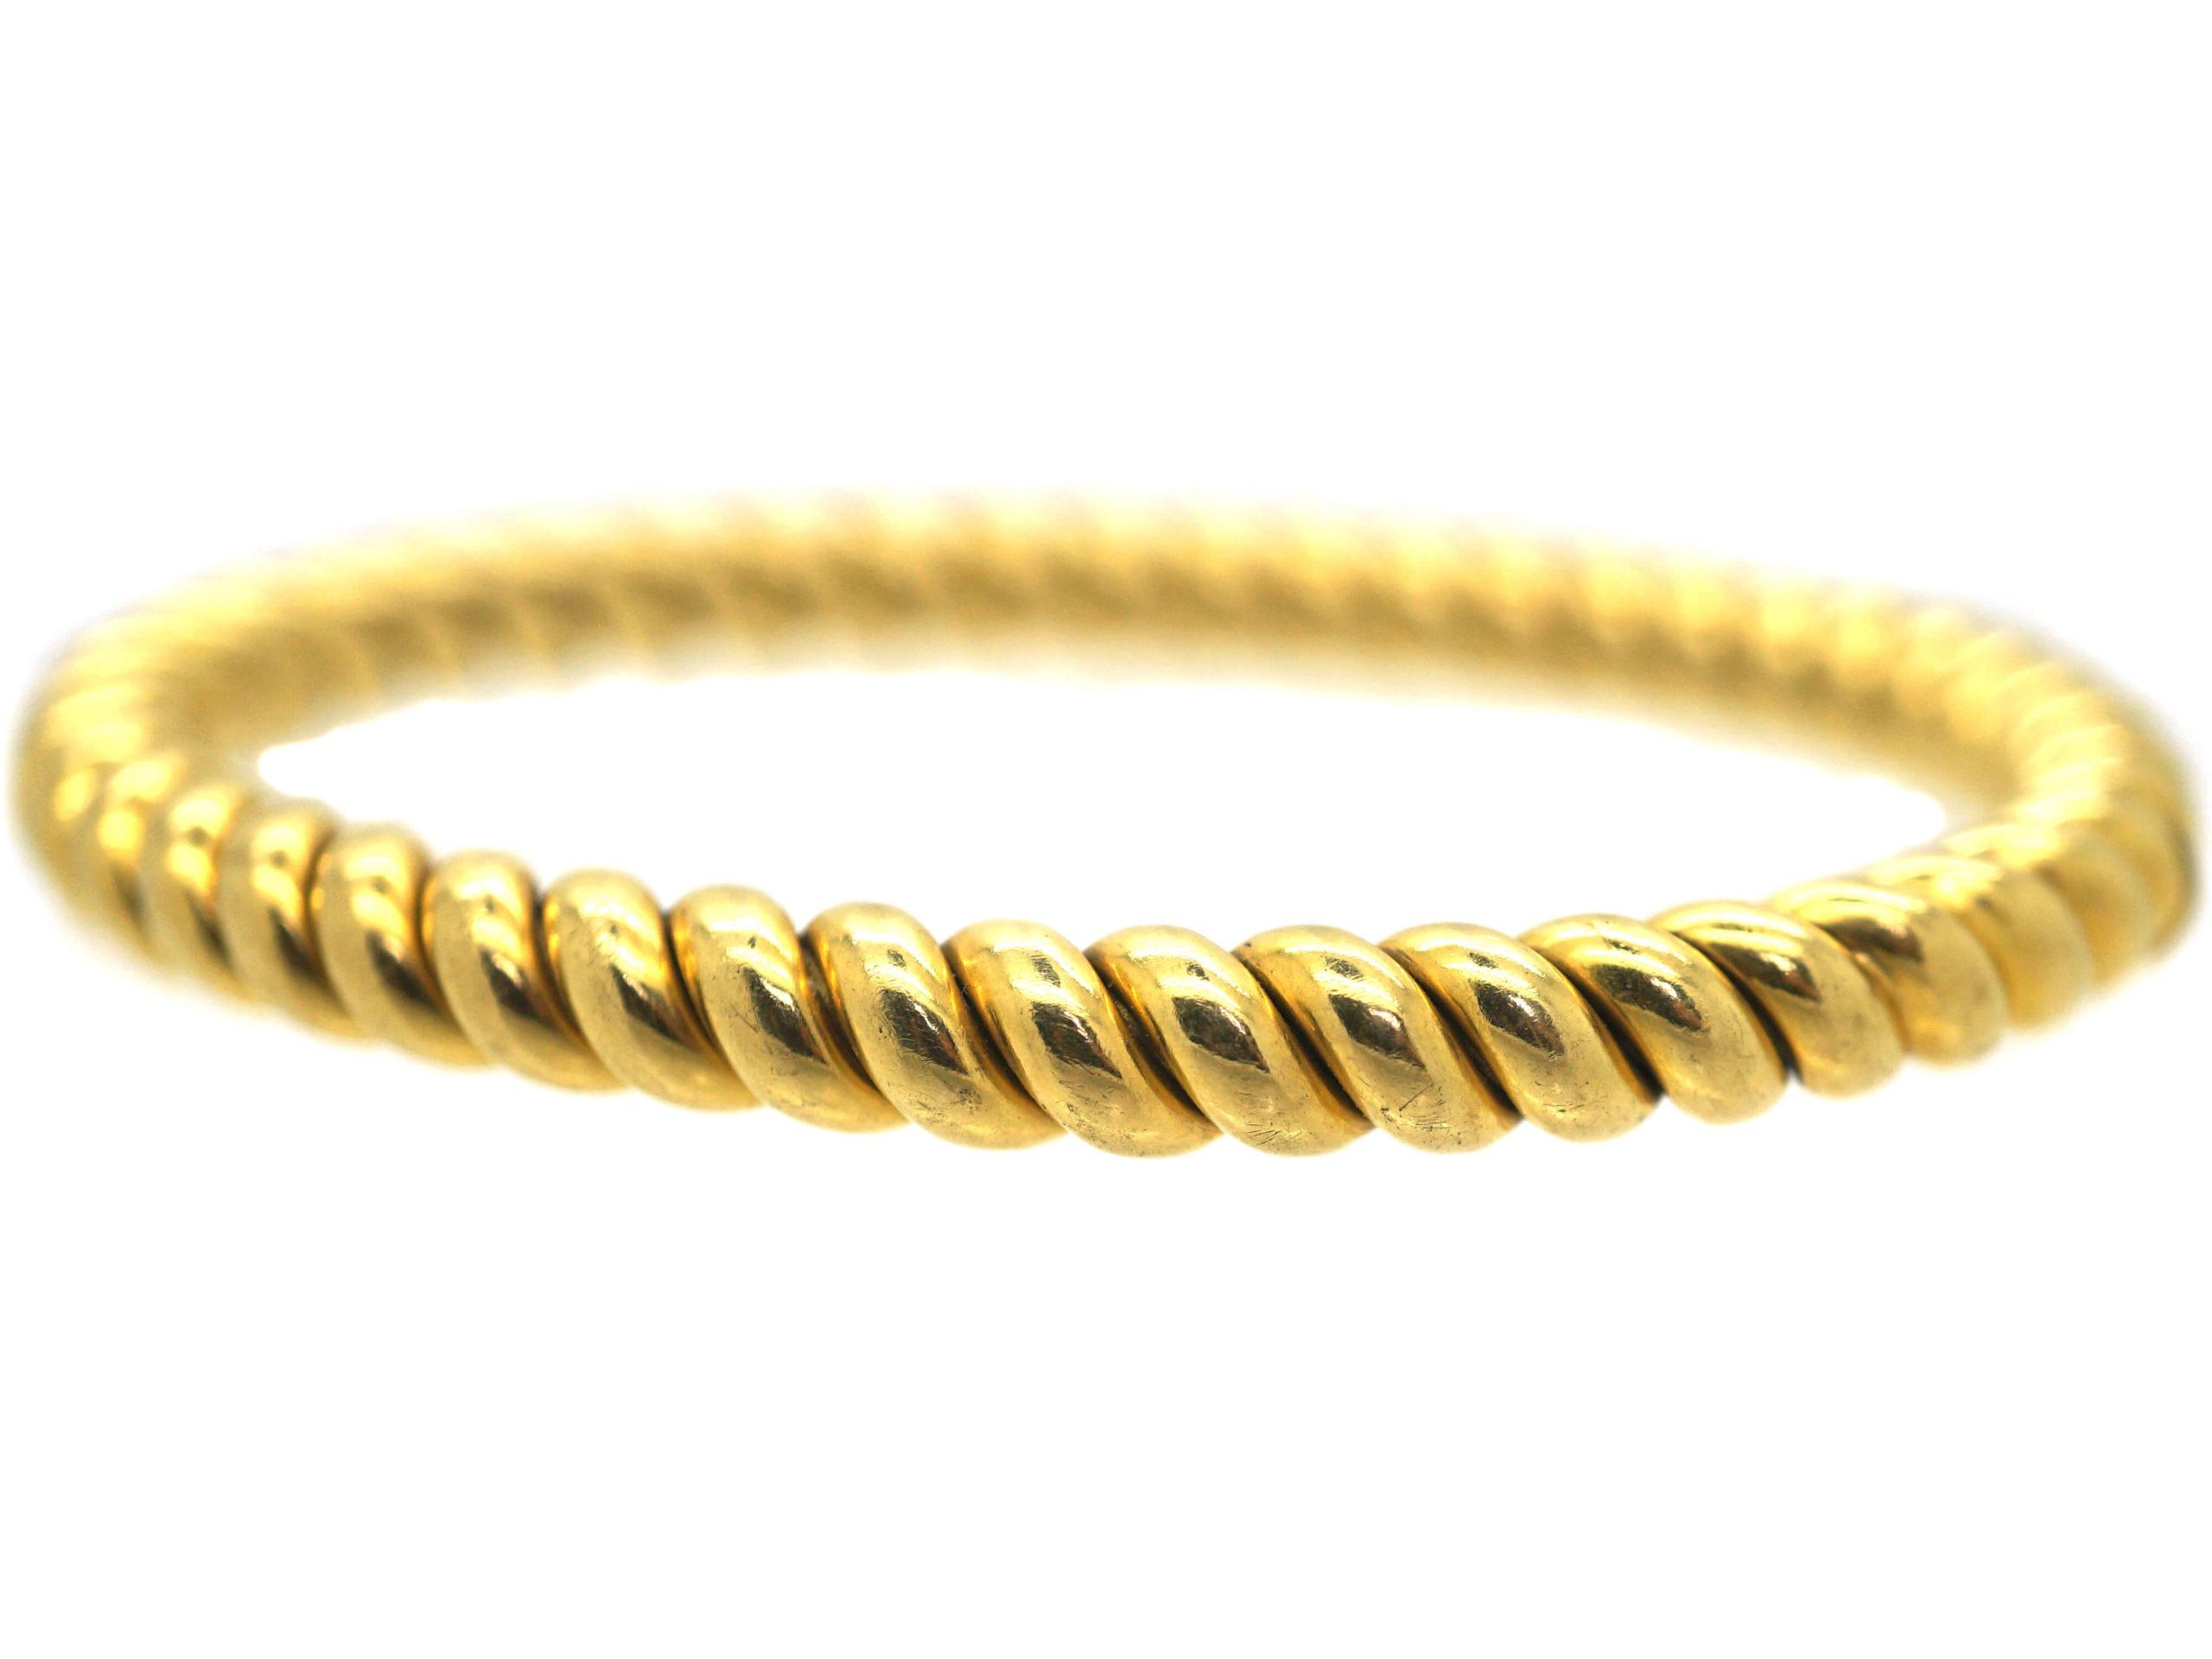 Edwardian 18ct Gold Twist Design Bangle